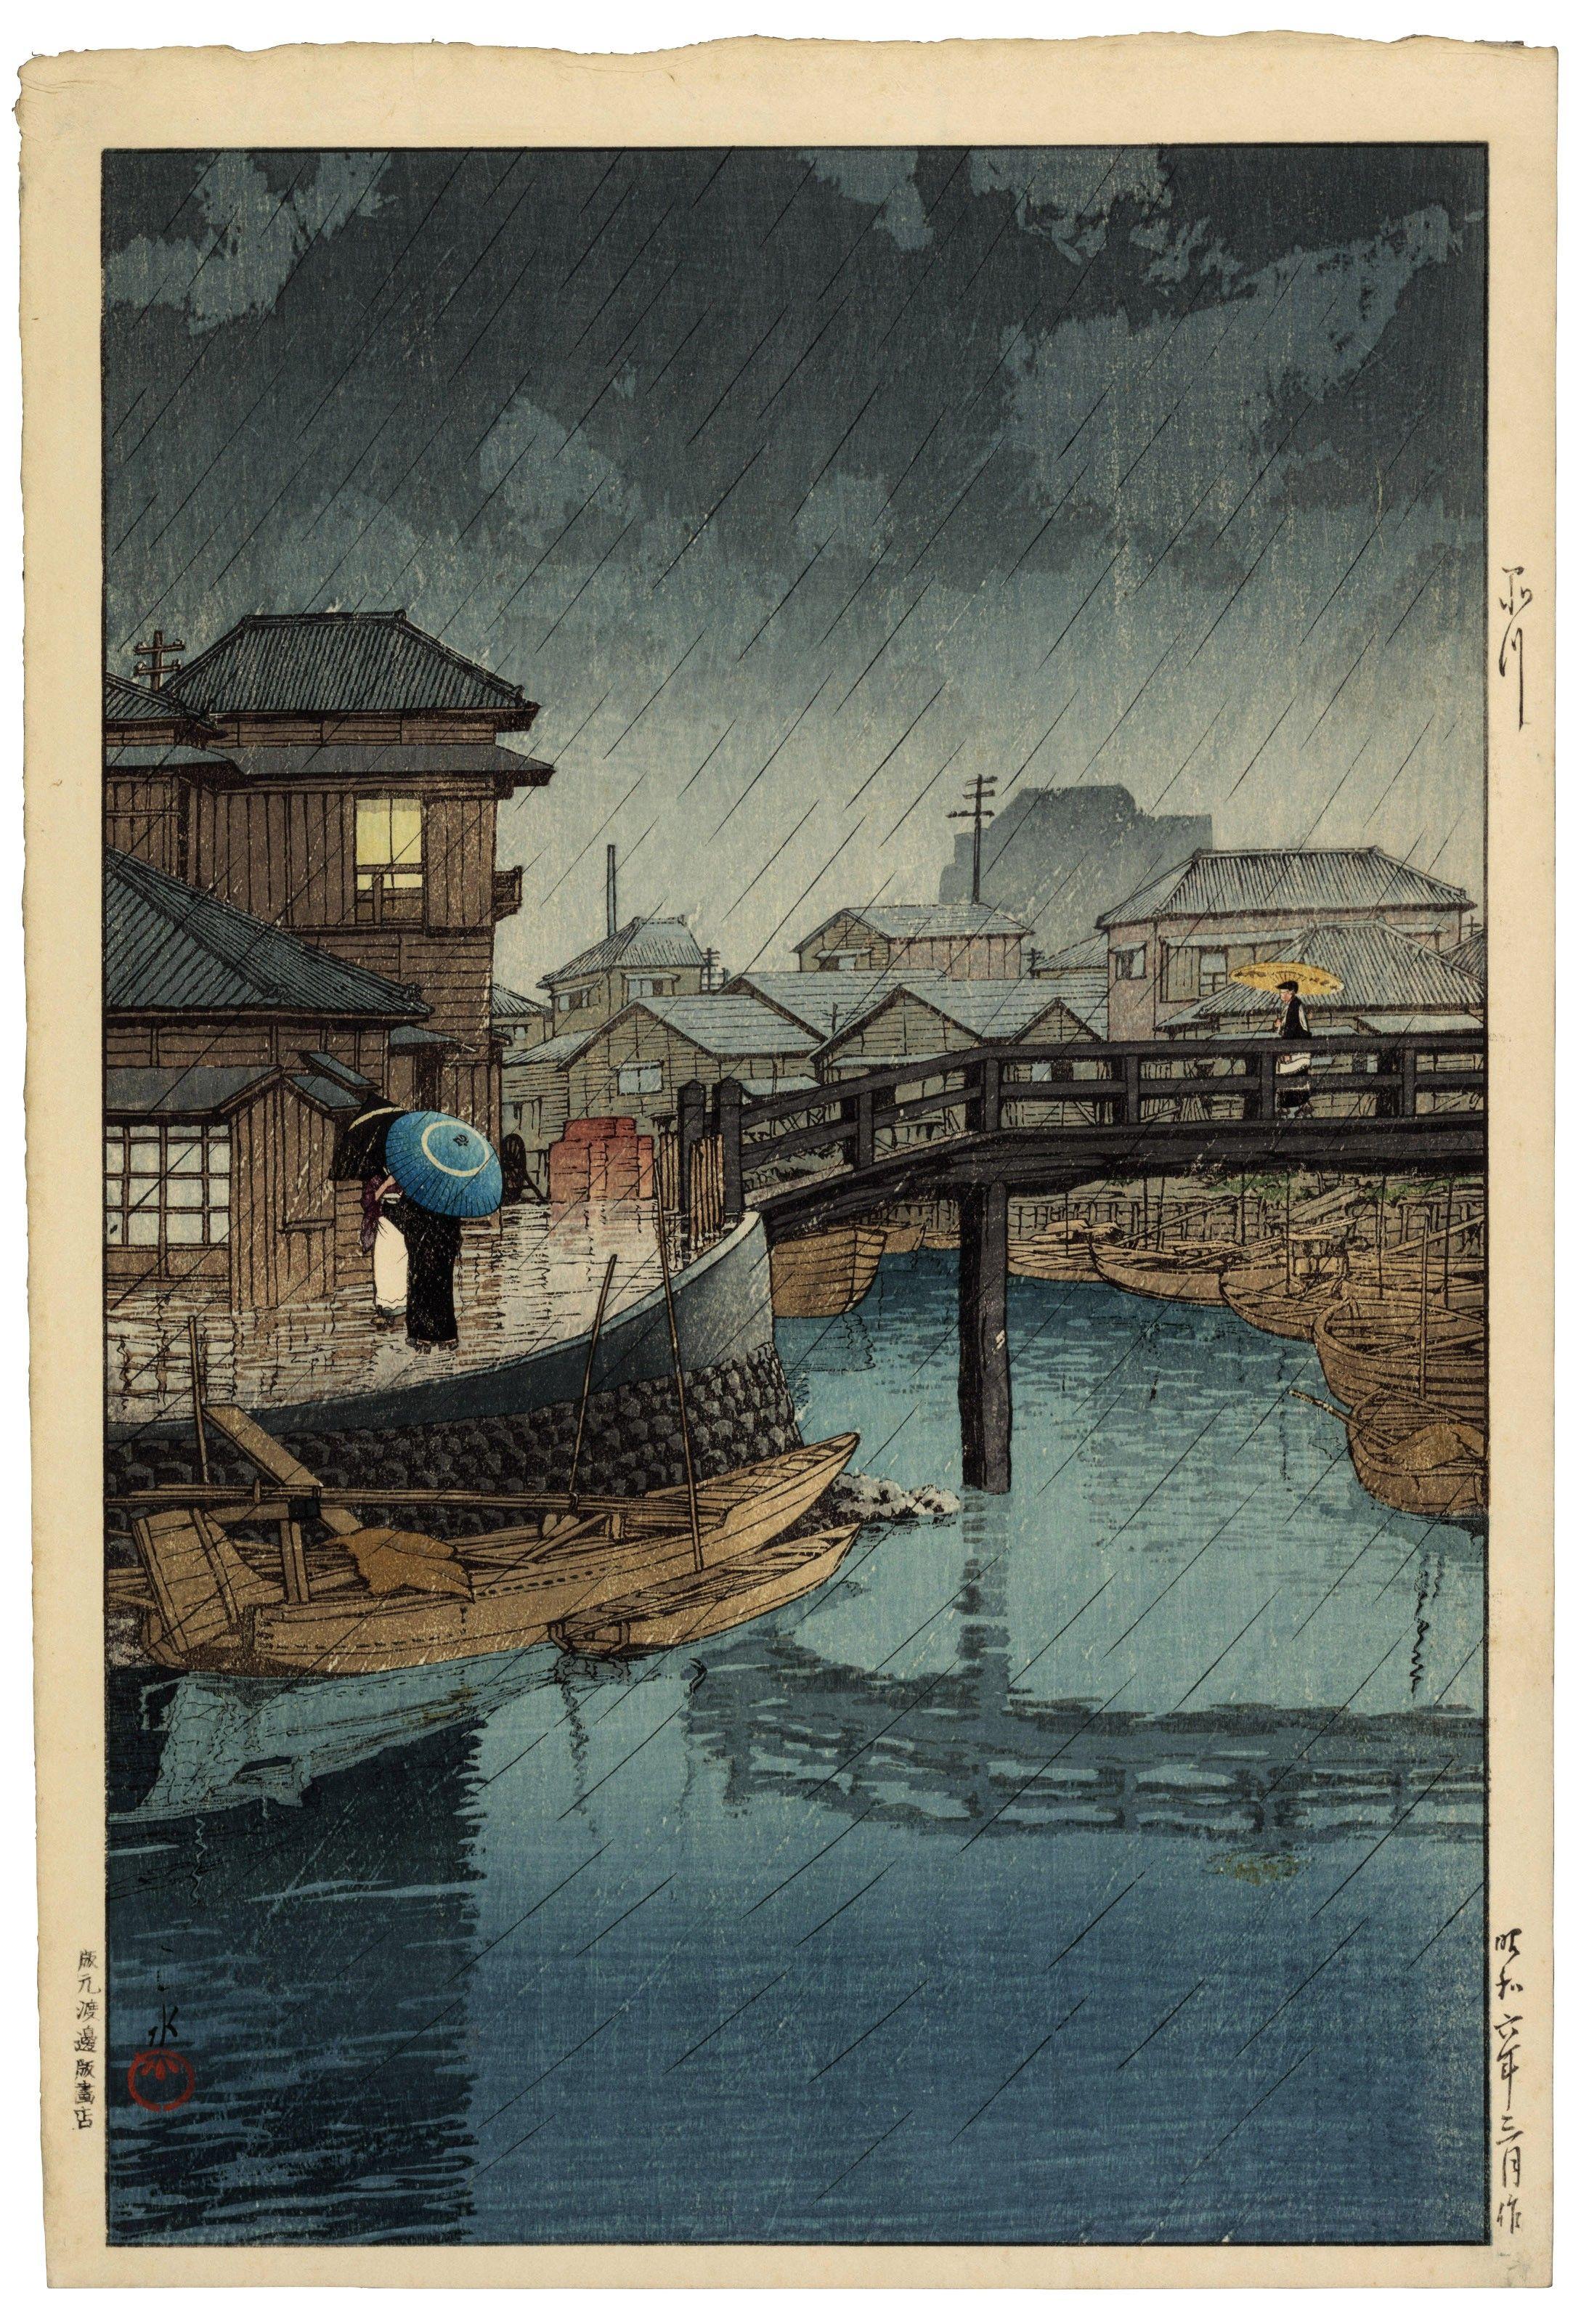 KAWASE HASUI (1883-1957) | Japanese woodblock printing, Japanese woodcut,  Japanese art